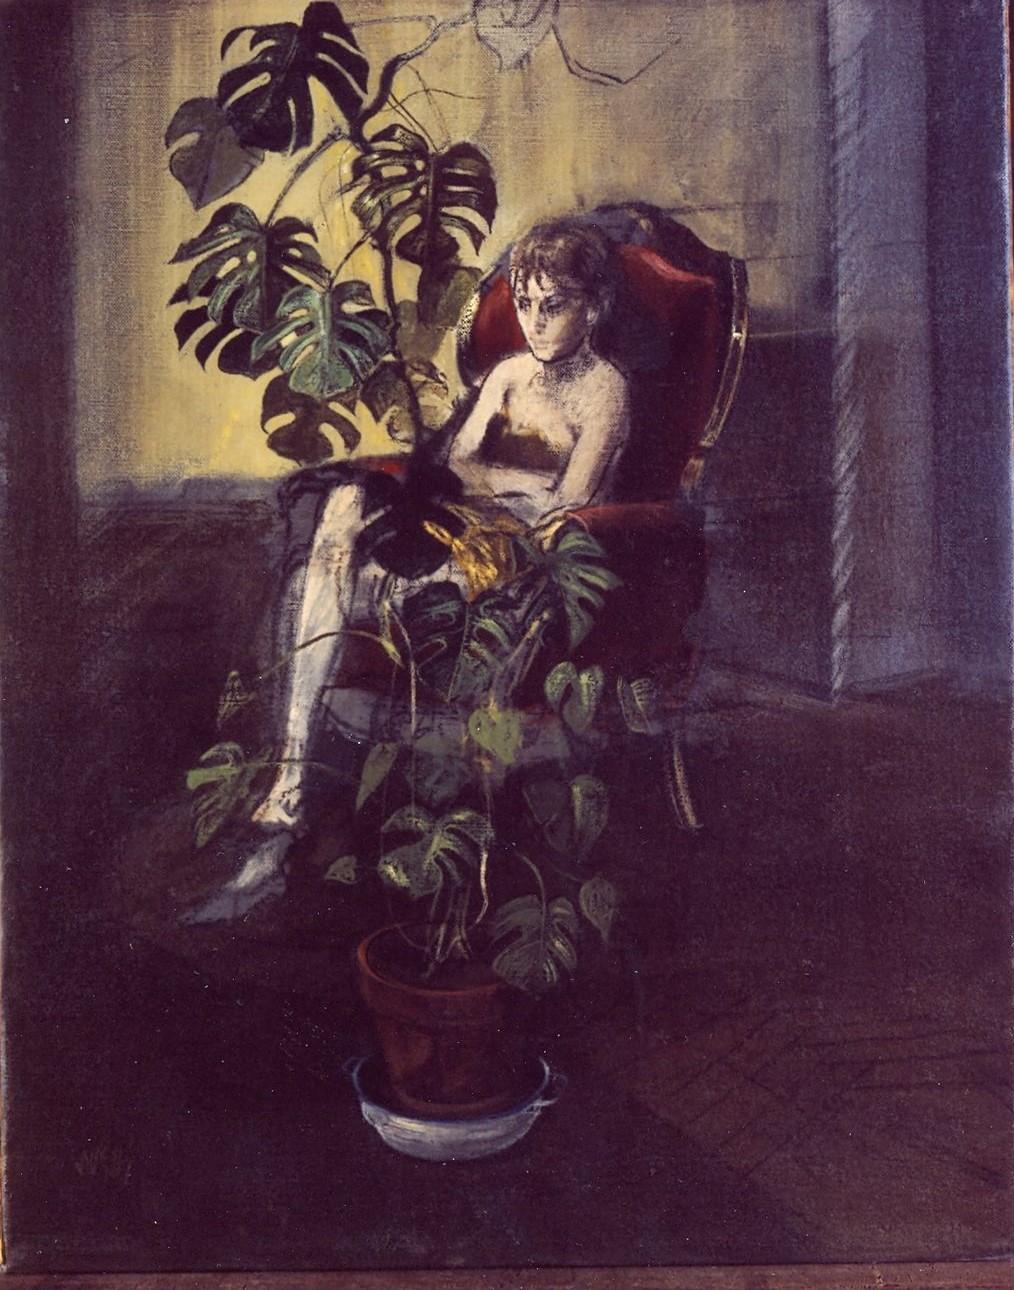 signora seduta (dipinto) di Sughi Alberto (sec. XX)